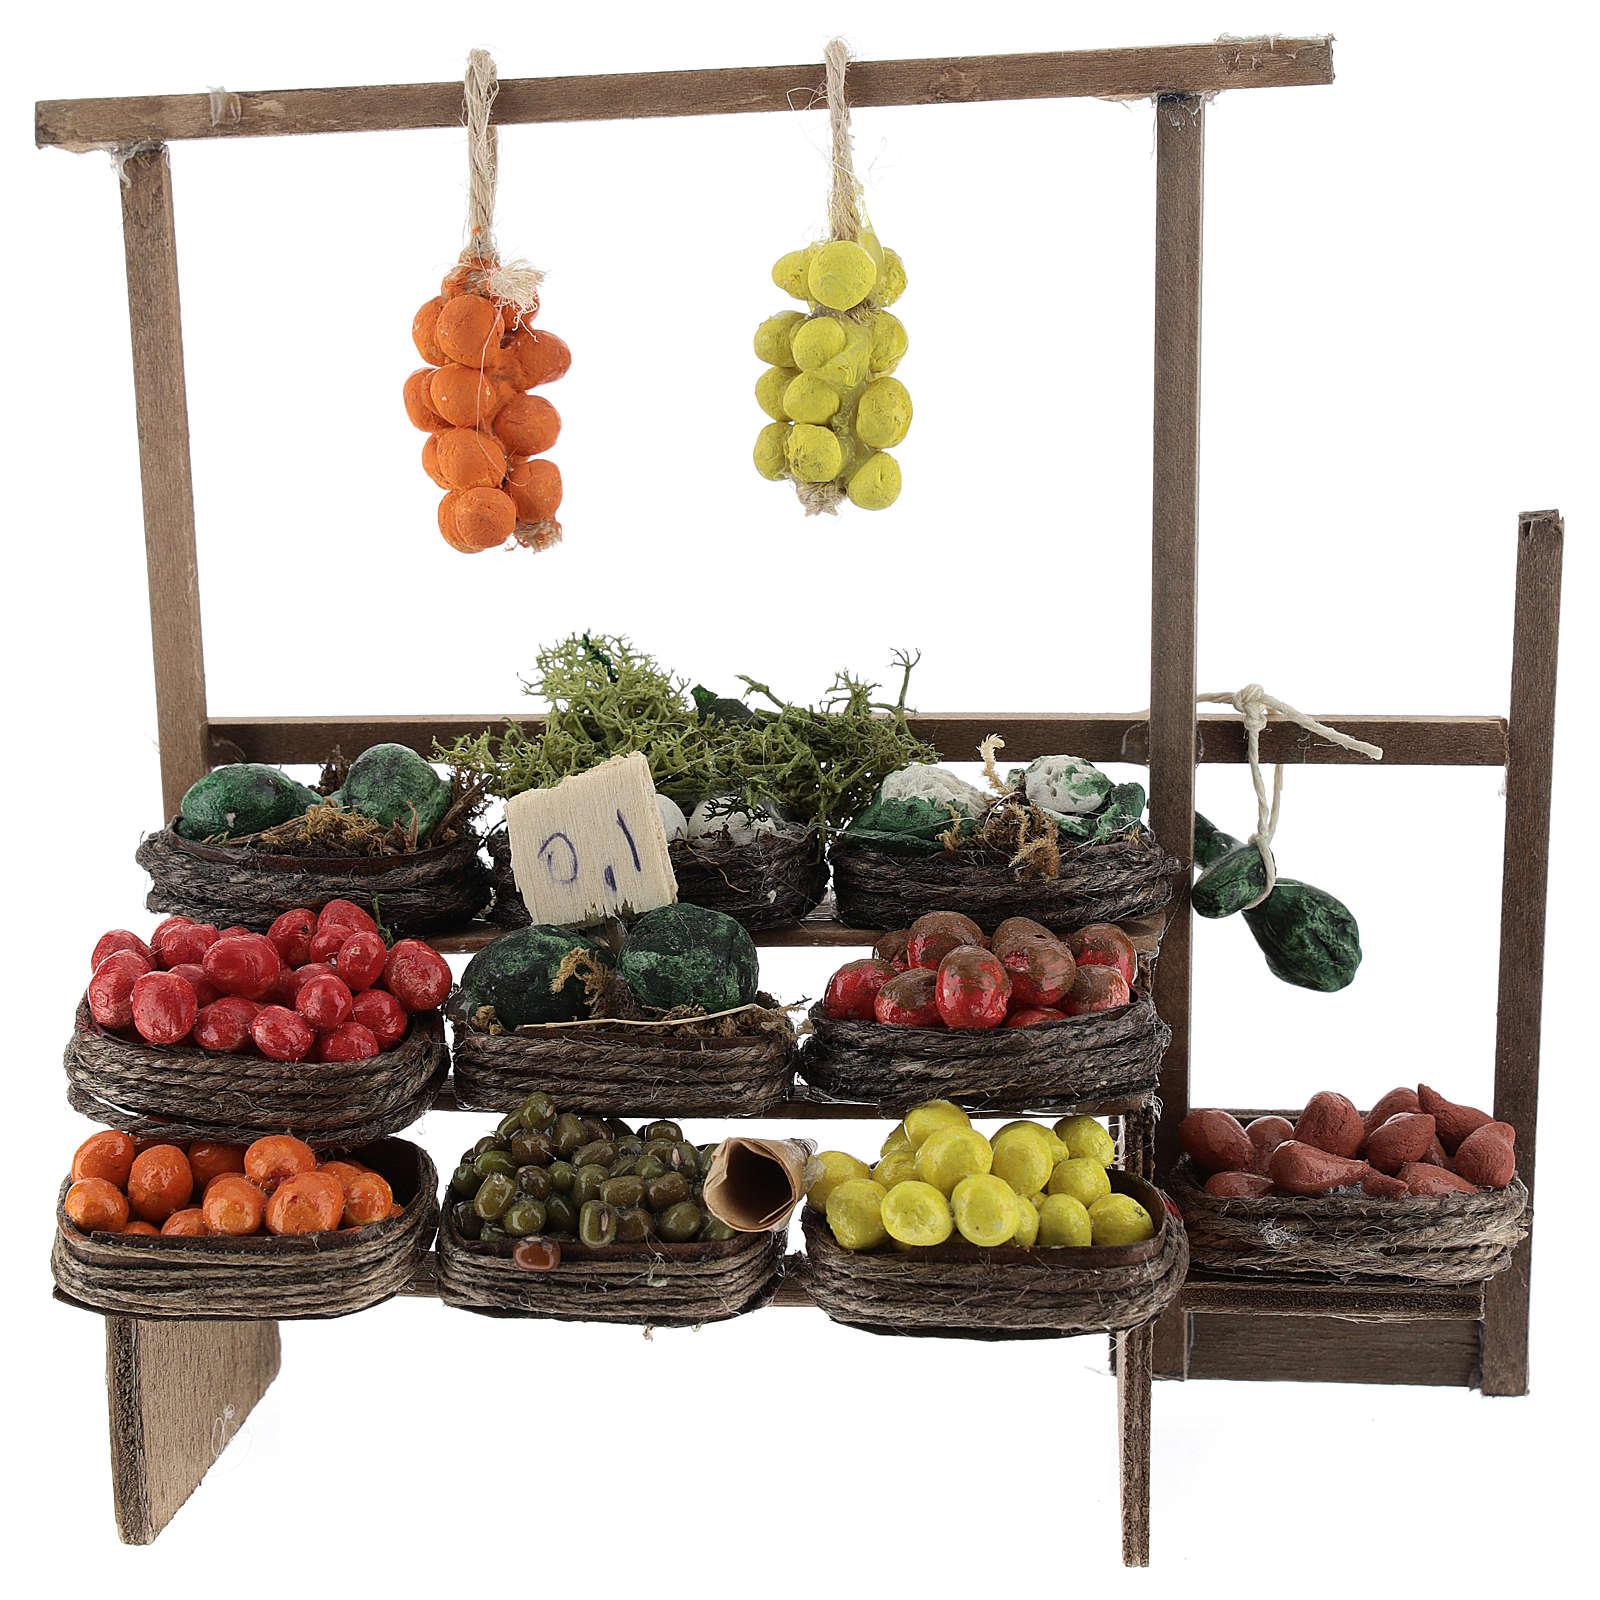 Banco de fruta pesebre artesanal Nápoles 4